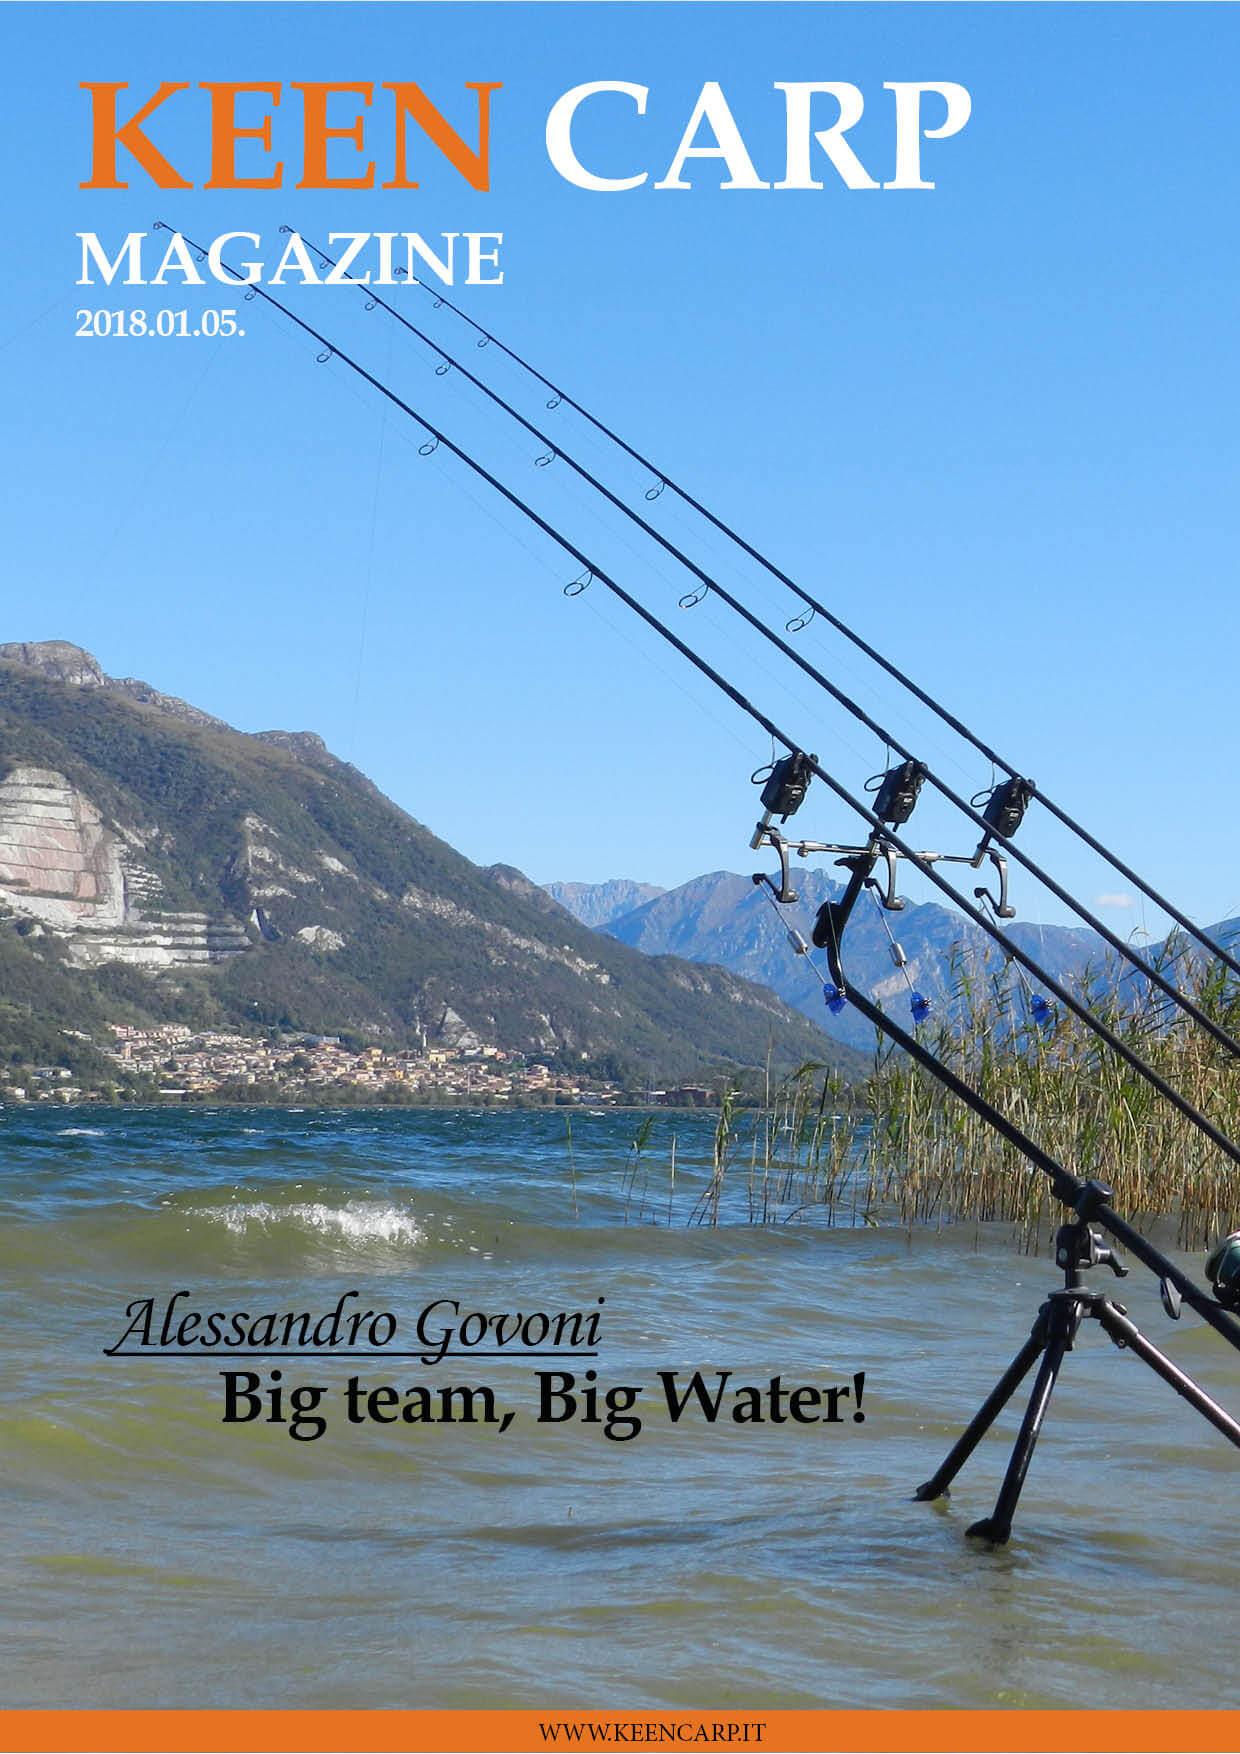 Big team, Big Water!